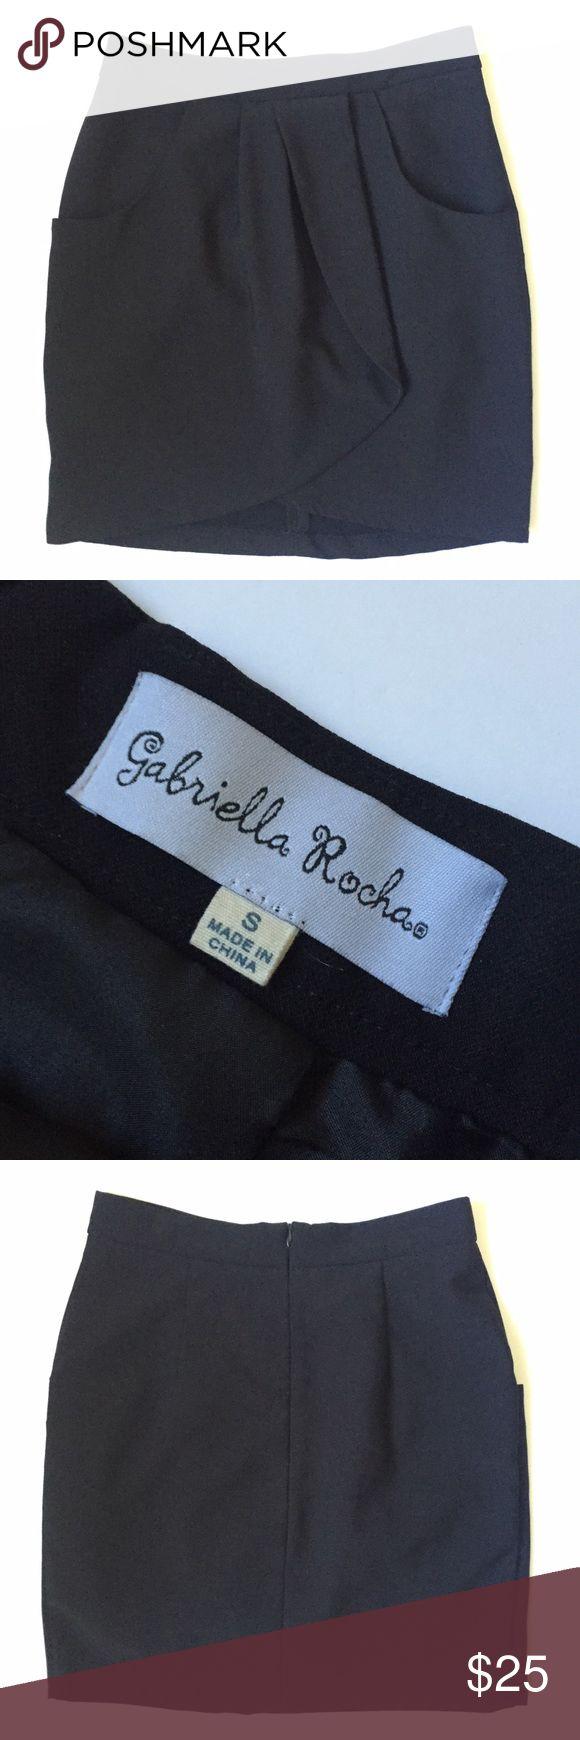 Gabriella Rocha Skirt This semi ruffle Gabriella Rocha skirt is very well made and has an inside slip and pockets! 100% Polyester. Gabriella Rocha Skirts Mini